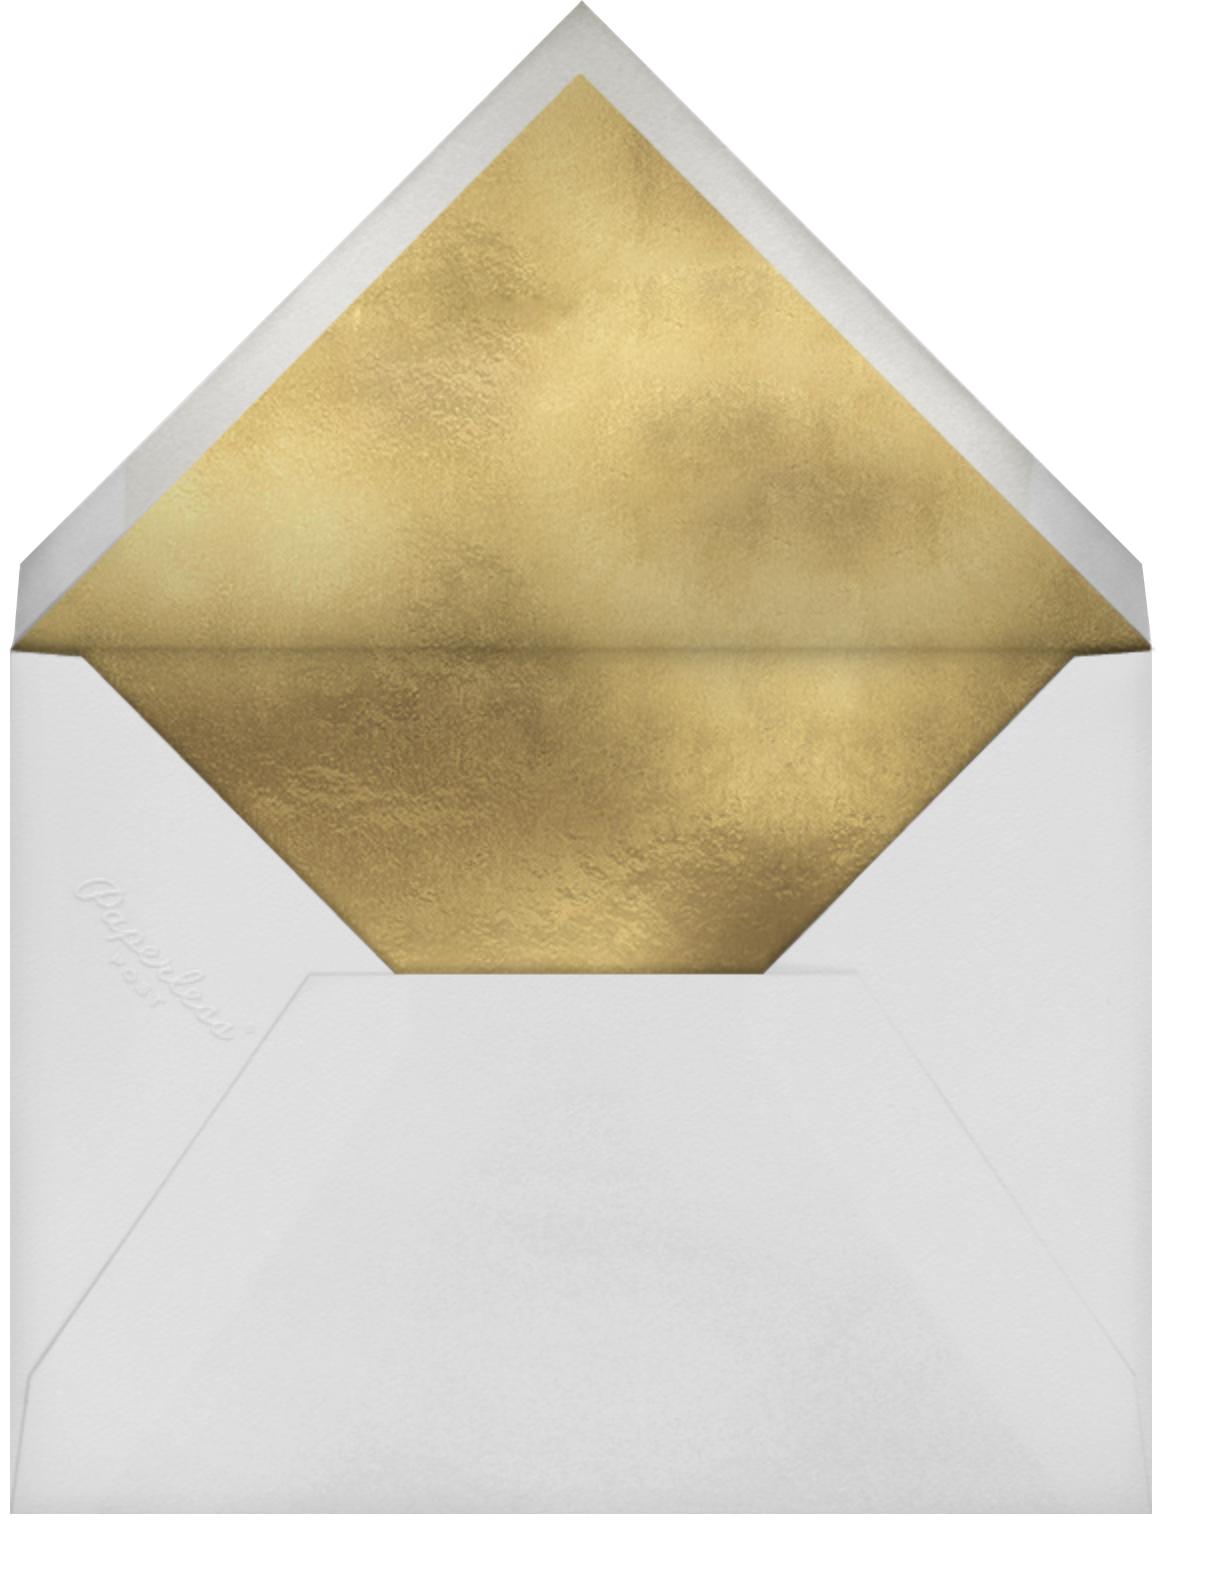 Fionola - Paperless Post - Memorial service - envelope back